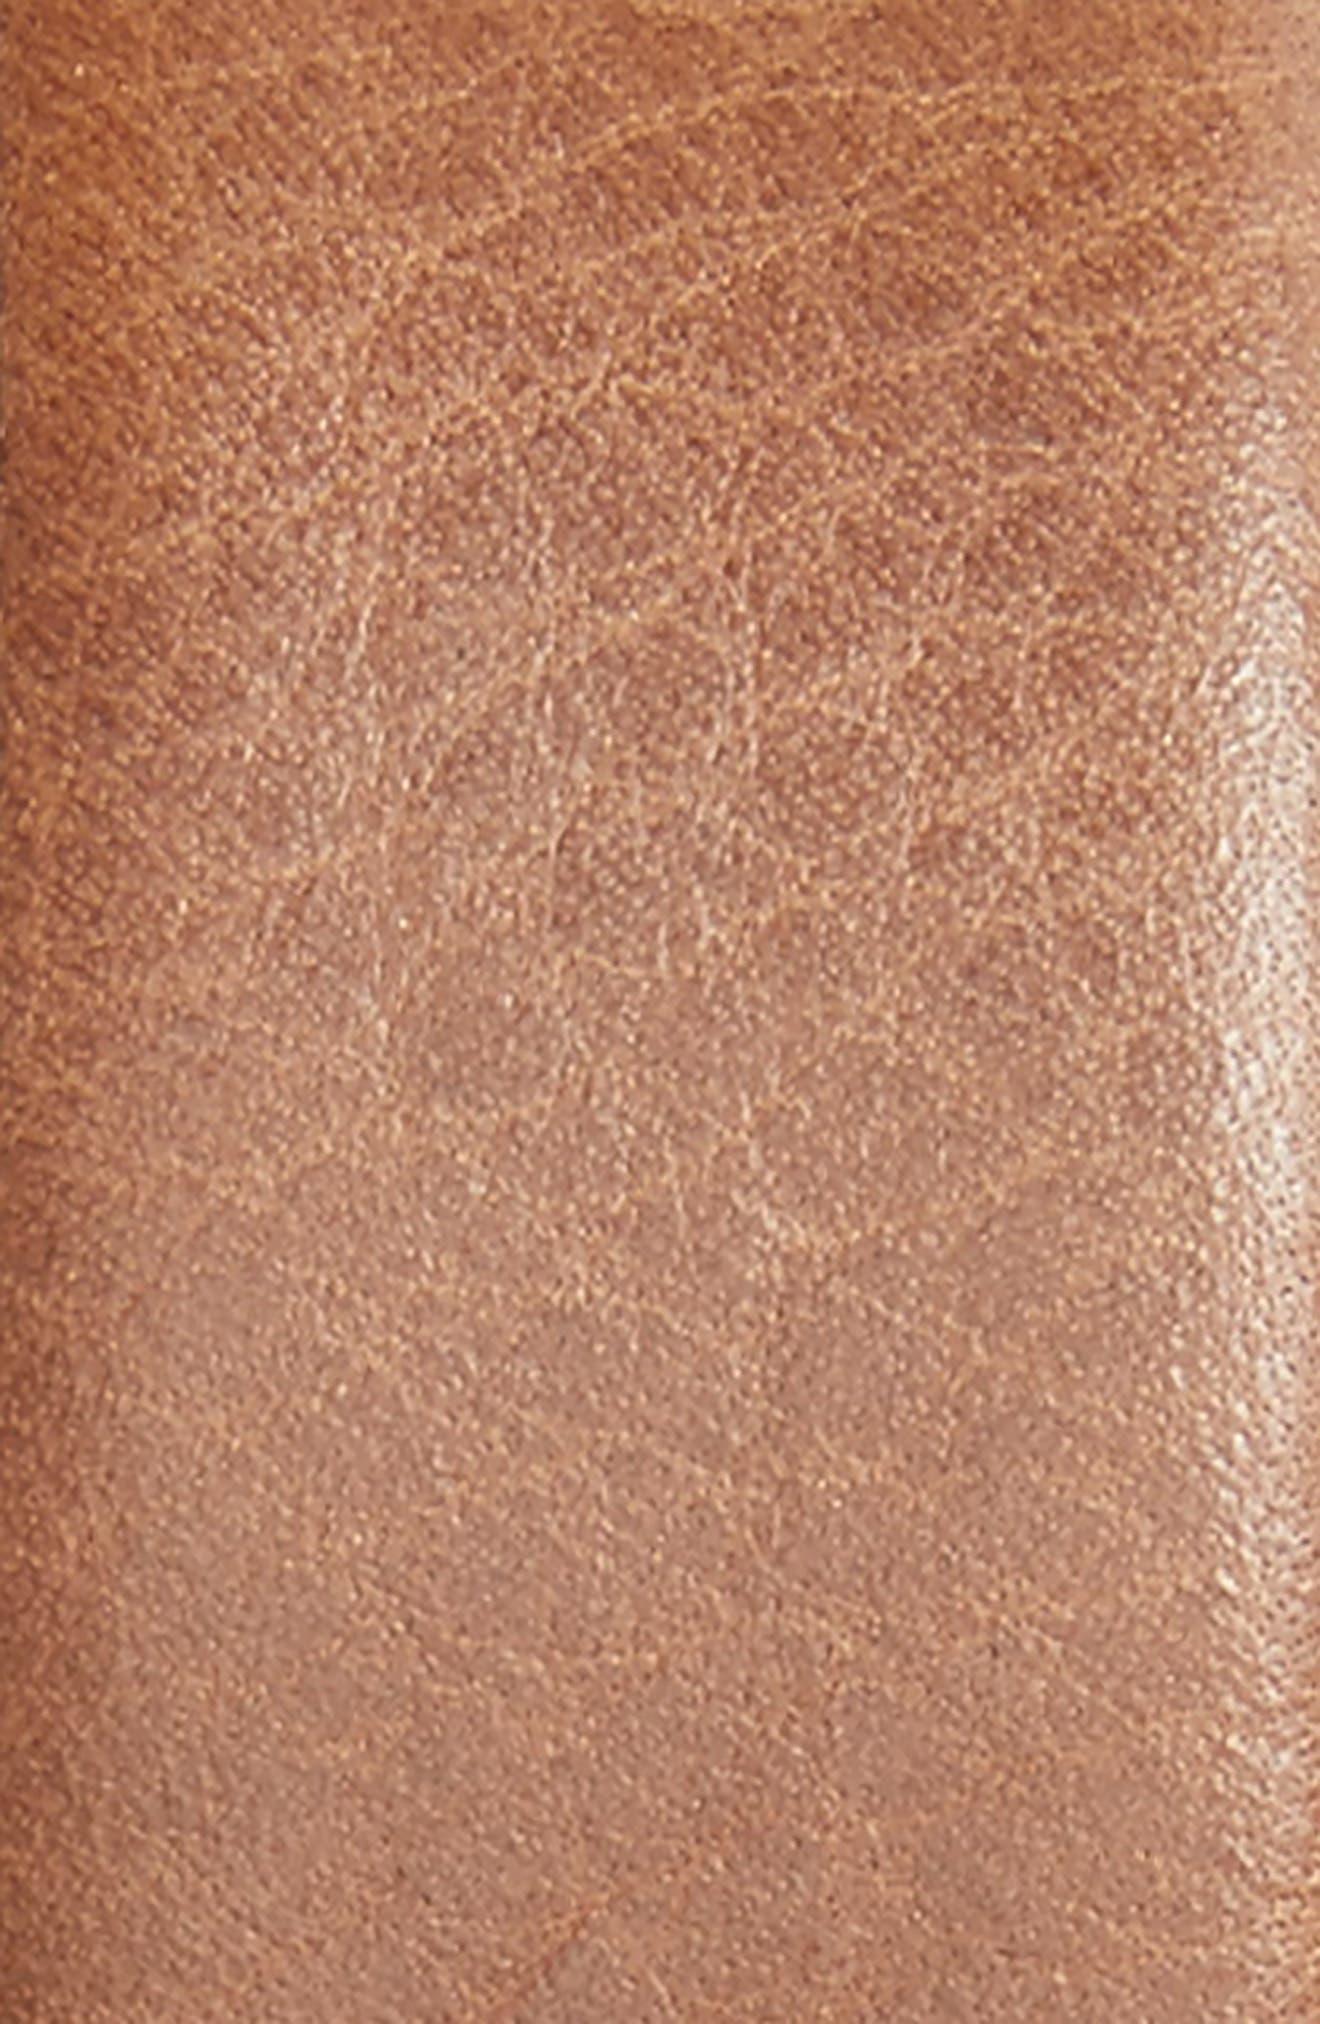 Marlin Leather Belt,                             Alternate thumbnail 2, color,                             Brown